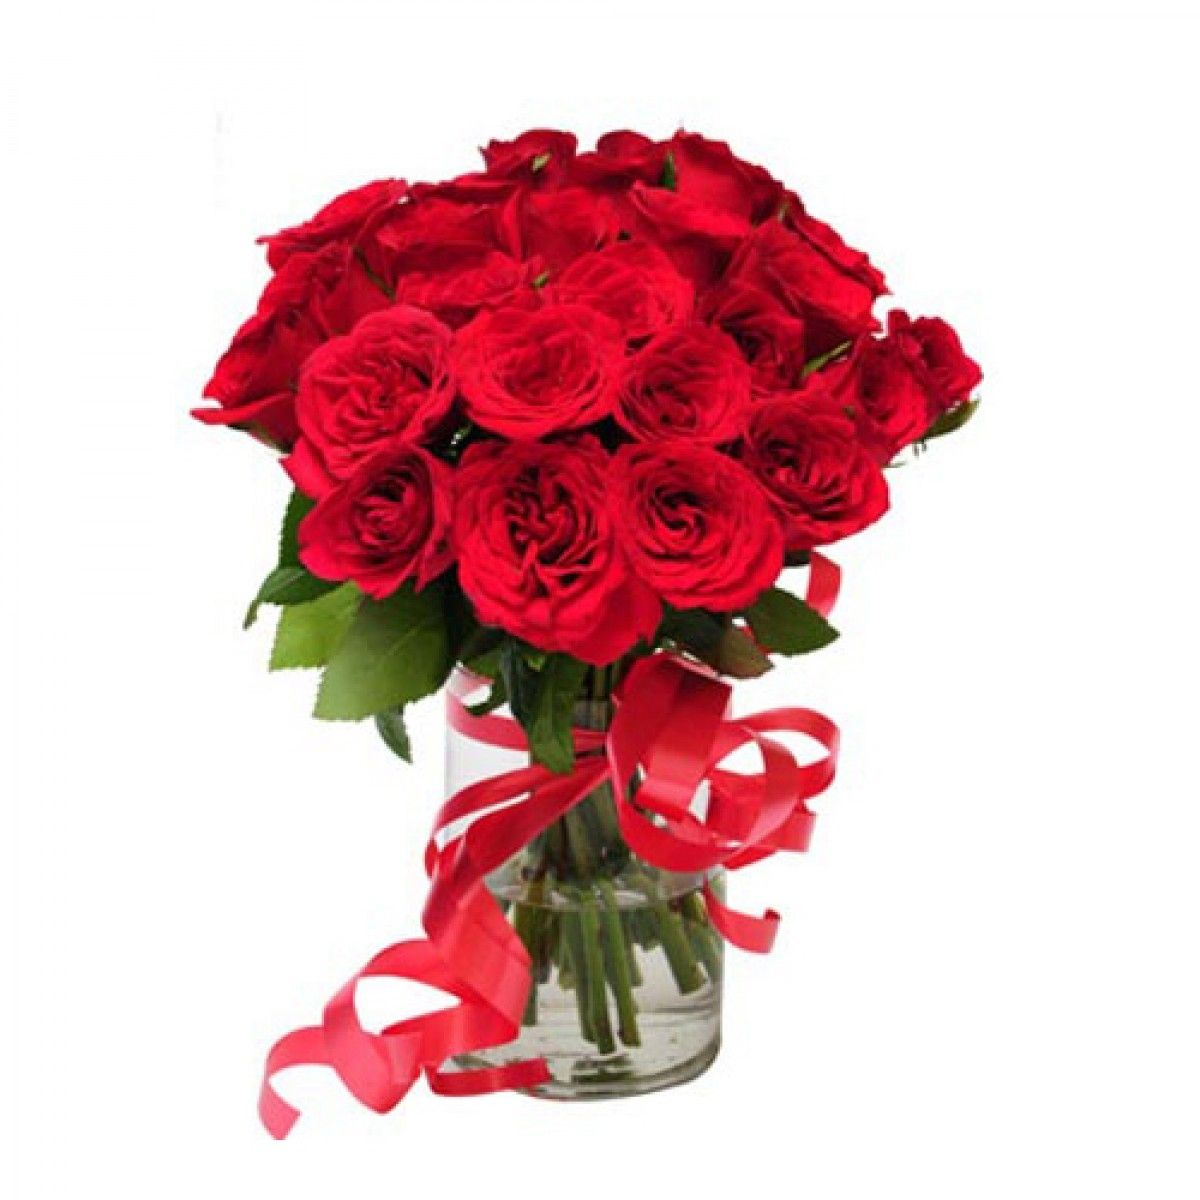 Rose flower vase images vase pinterest flower vases rose and flower izmirmasajfo Choice Image